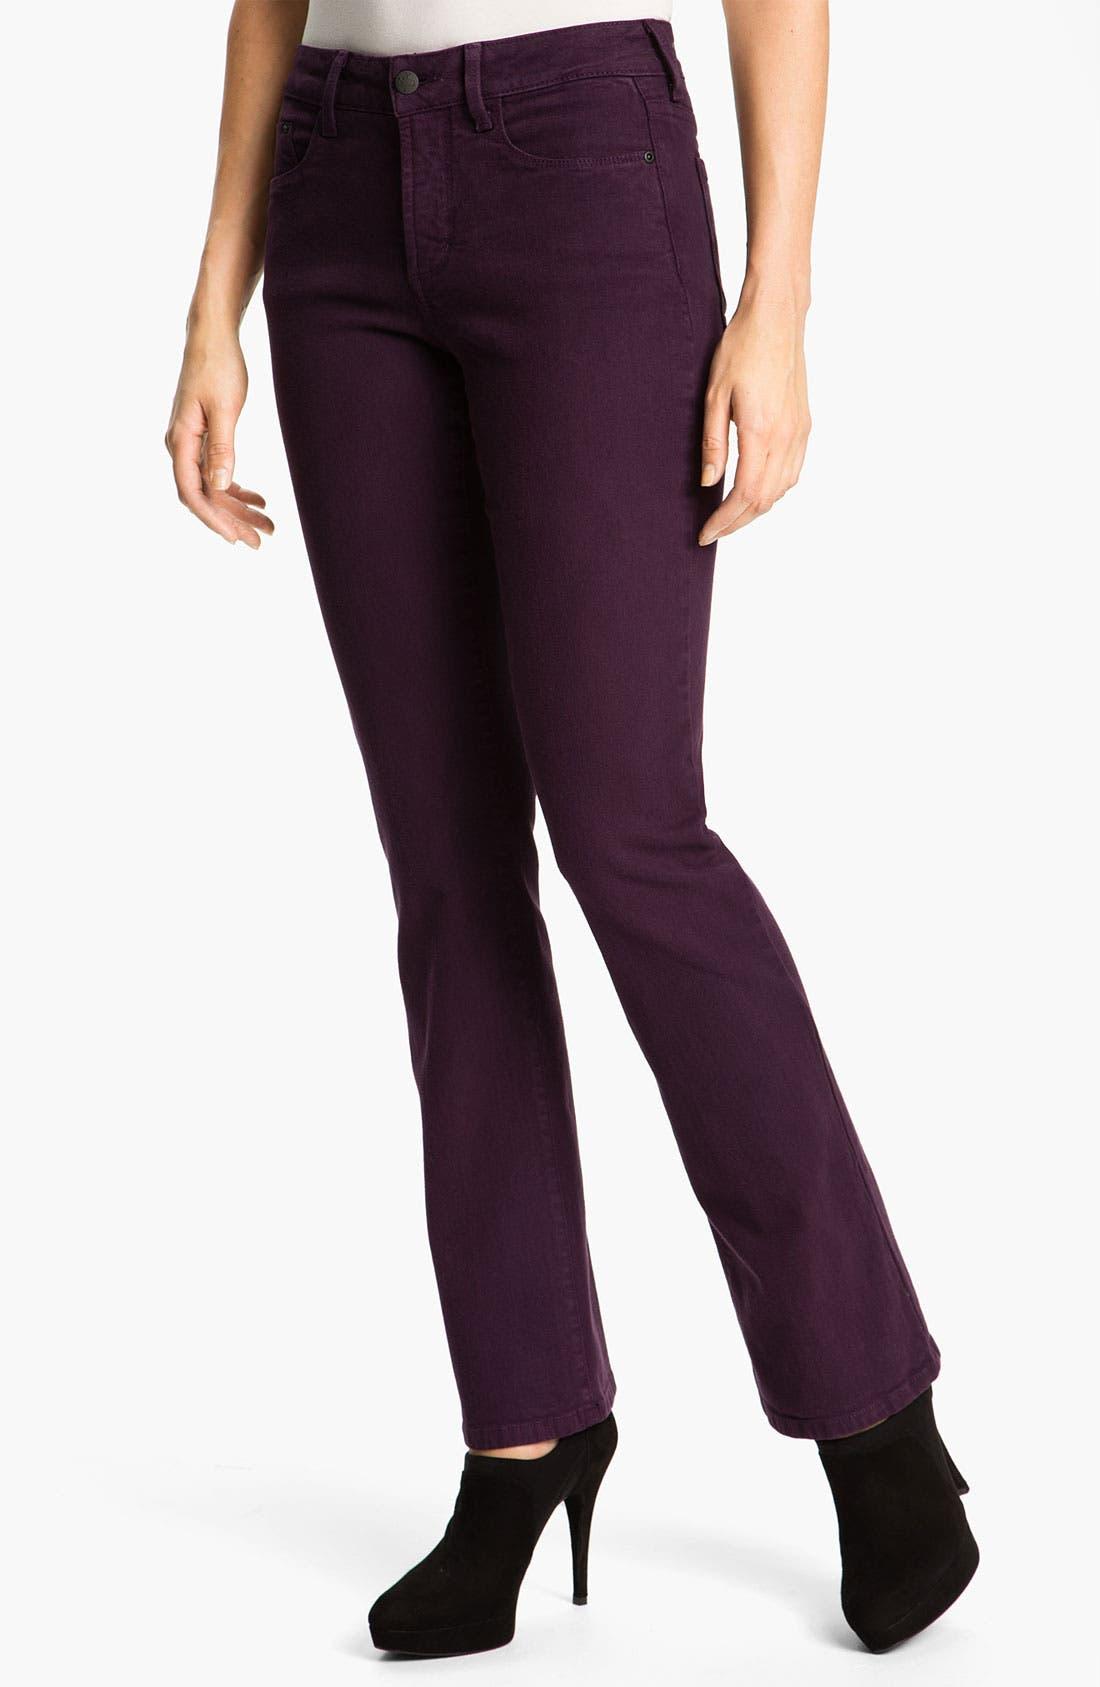 Main Image - NYDJ 'Barbara' Colored Denim Bootcut Jeans